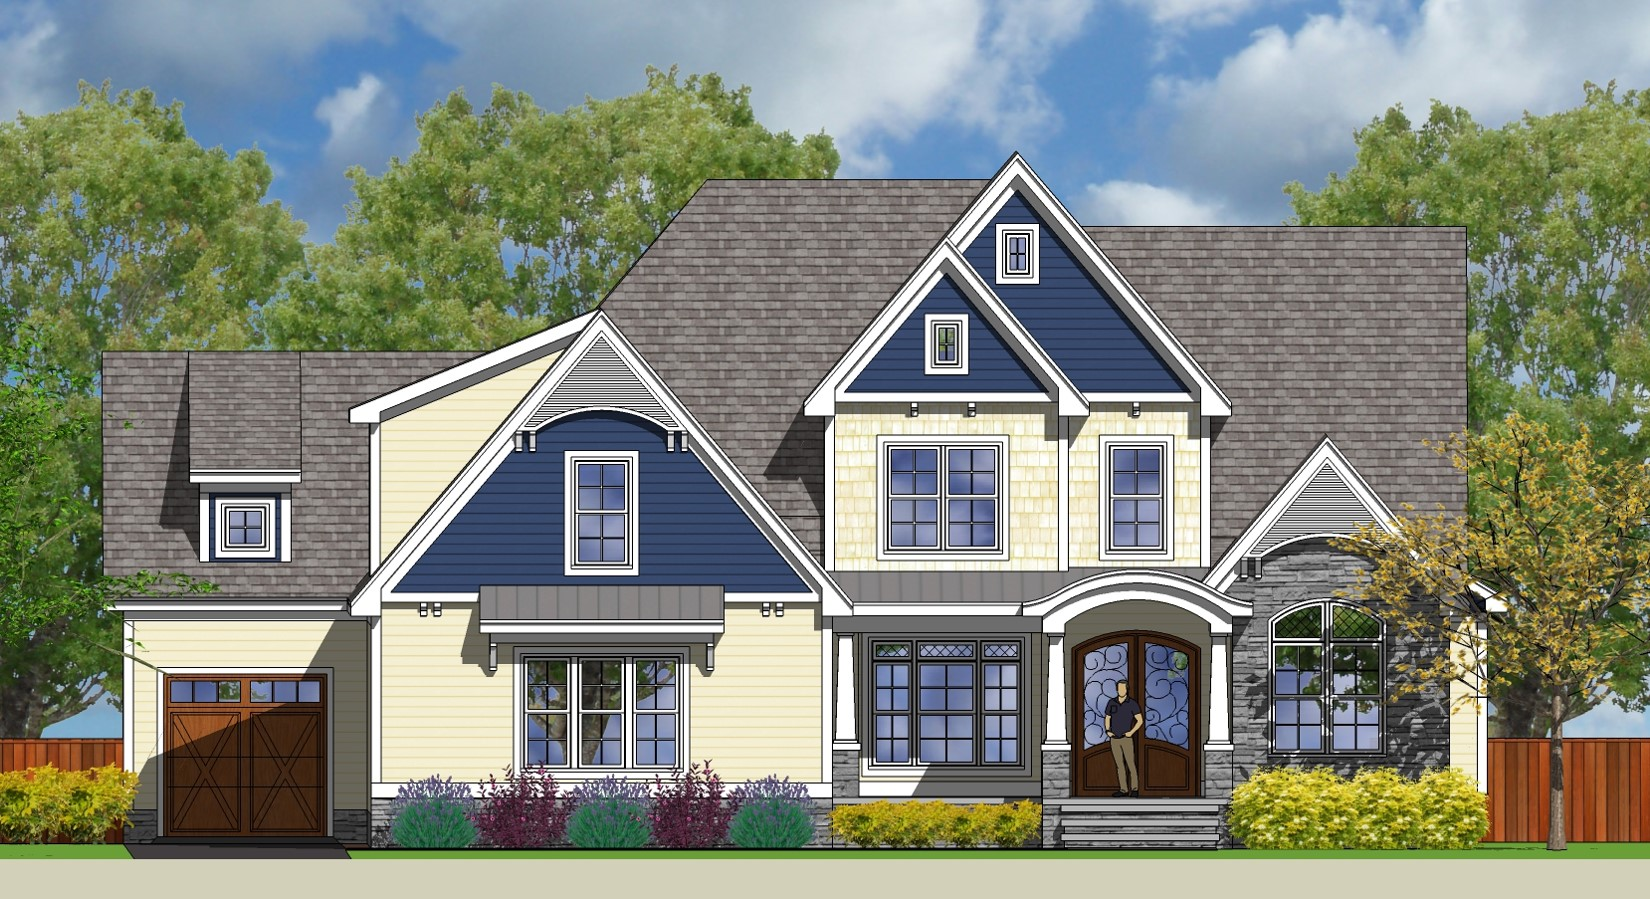 Cjc custom homes llc custom crafted homes for C m custom homes